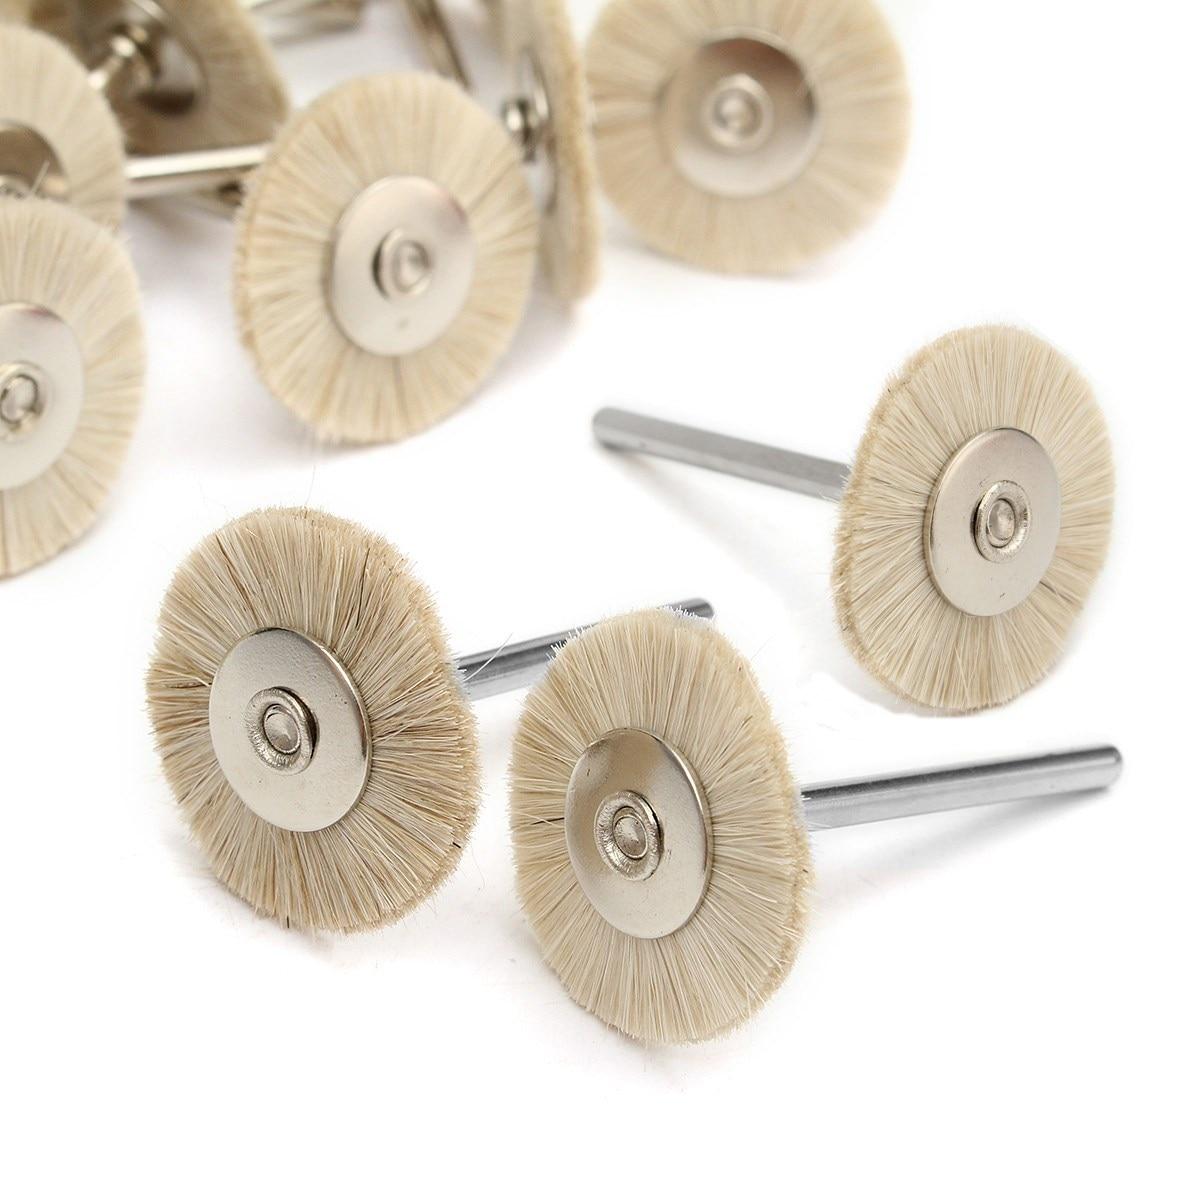 30pcs Dental Polishing Brushes 3mm Soft White Goat Hair Buffing Cleaning Wheels Brush Burs For Dental Lab Rotary Tools 2018